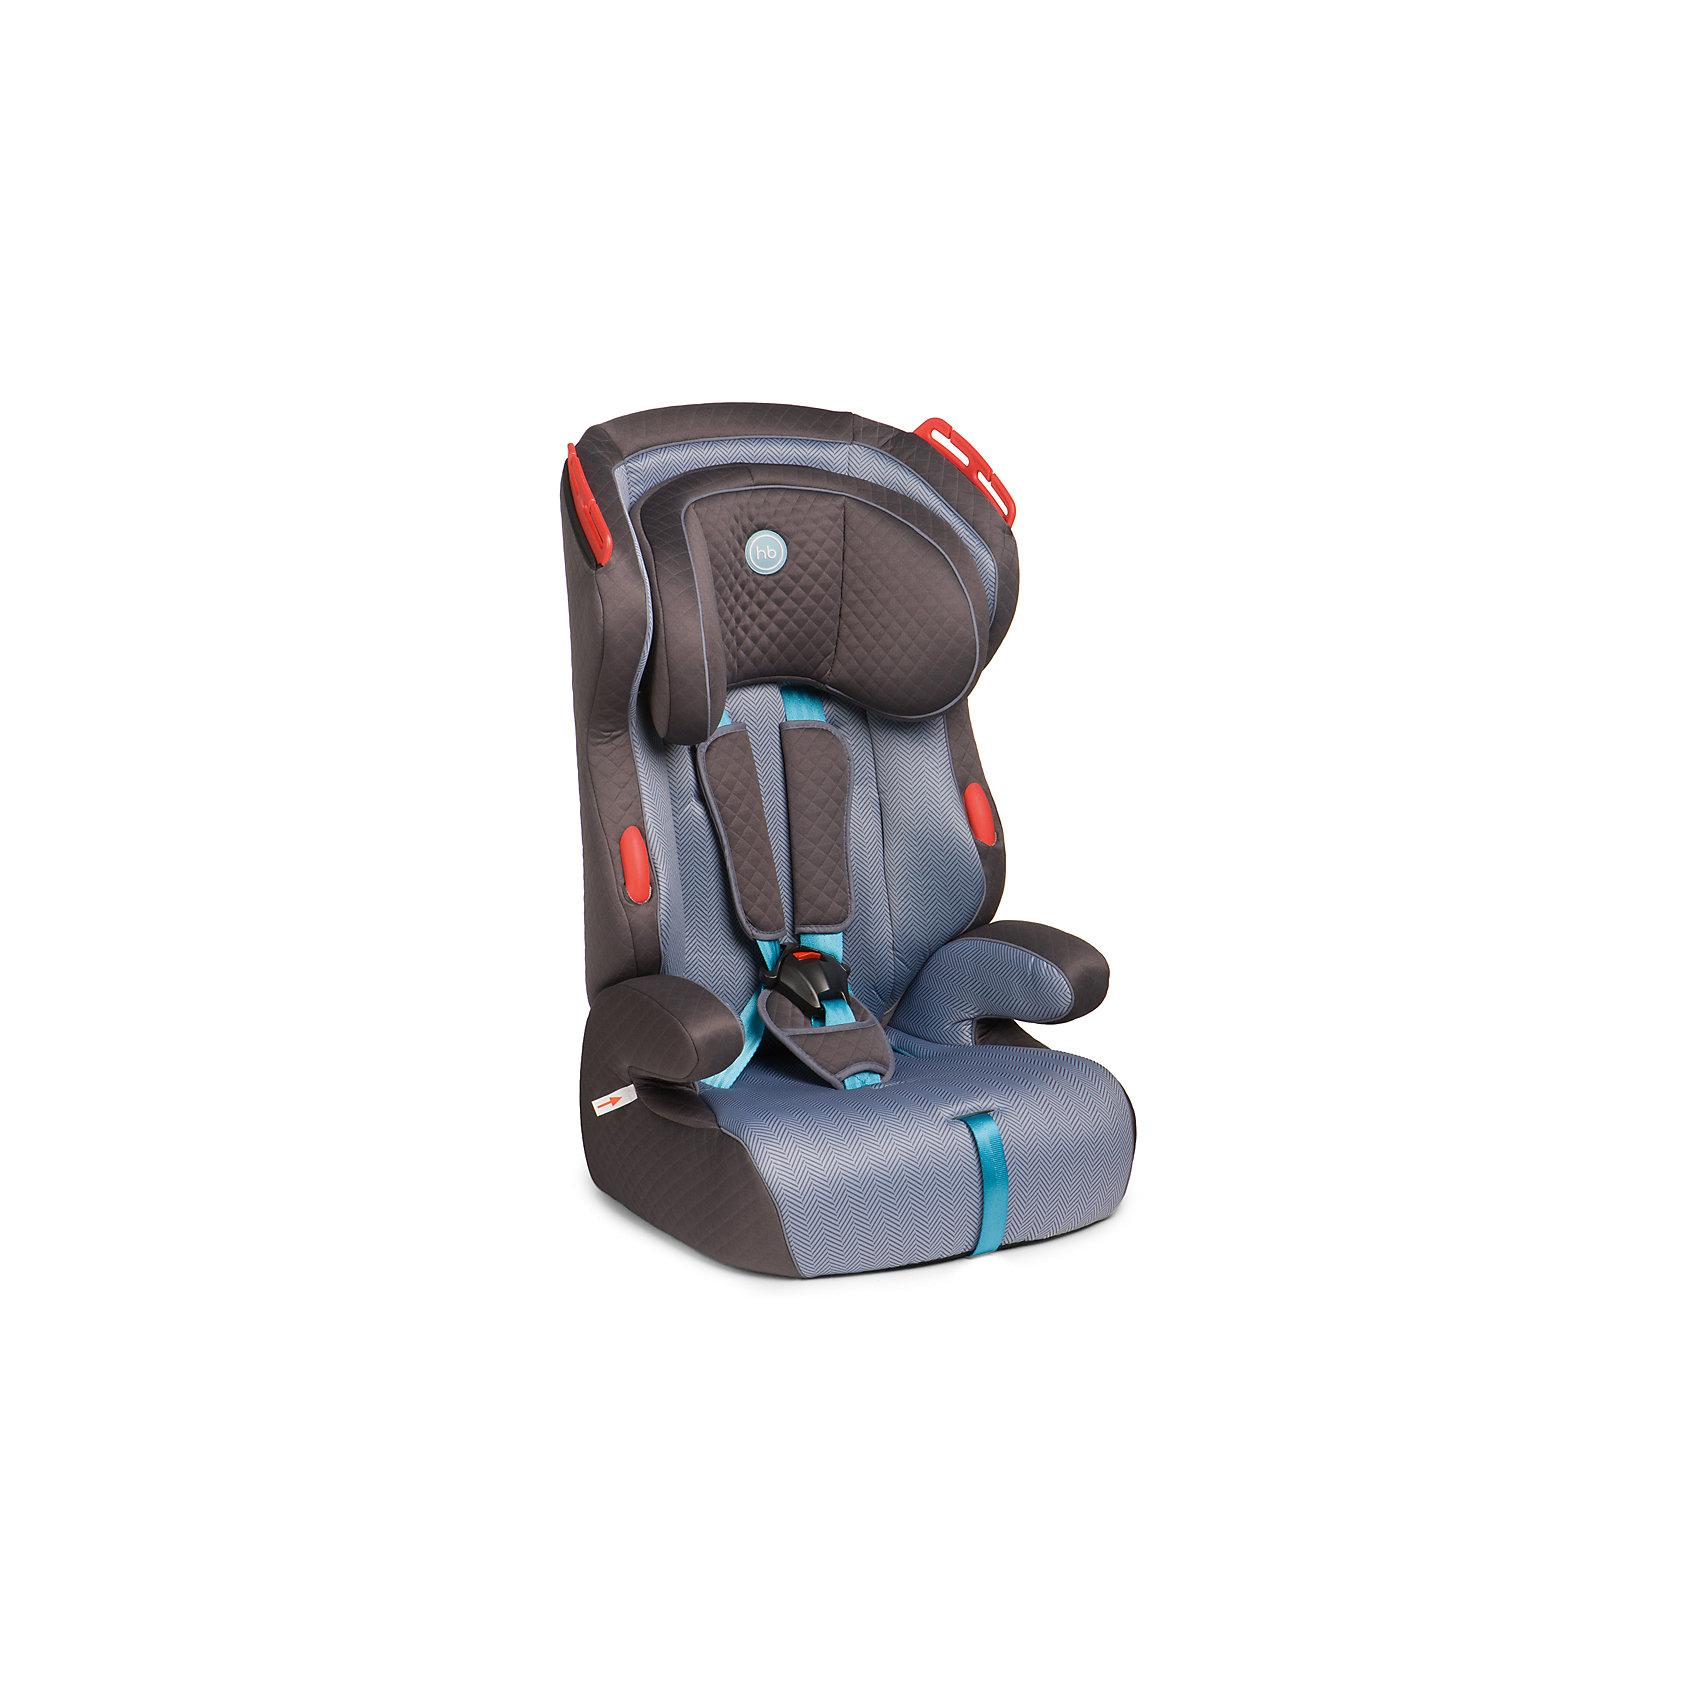 Автокресло Atlant, 9-36 кг., Happy Baby, серый/голубой